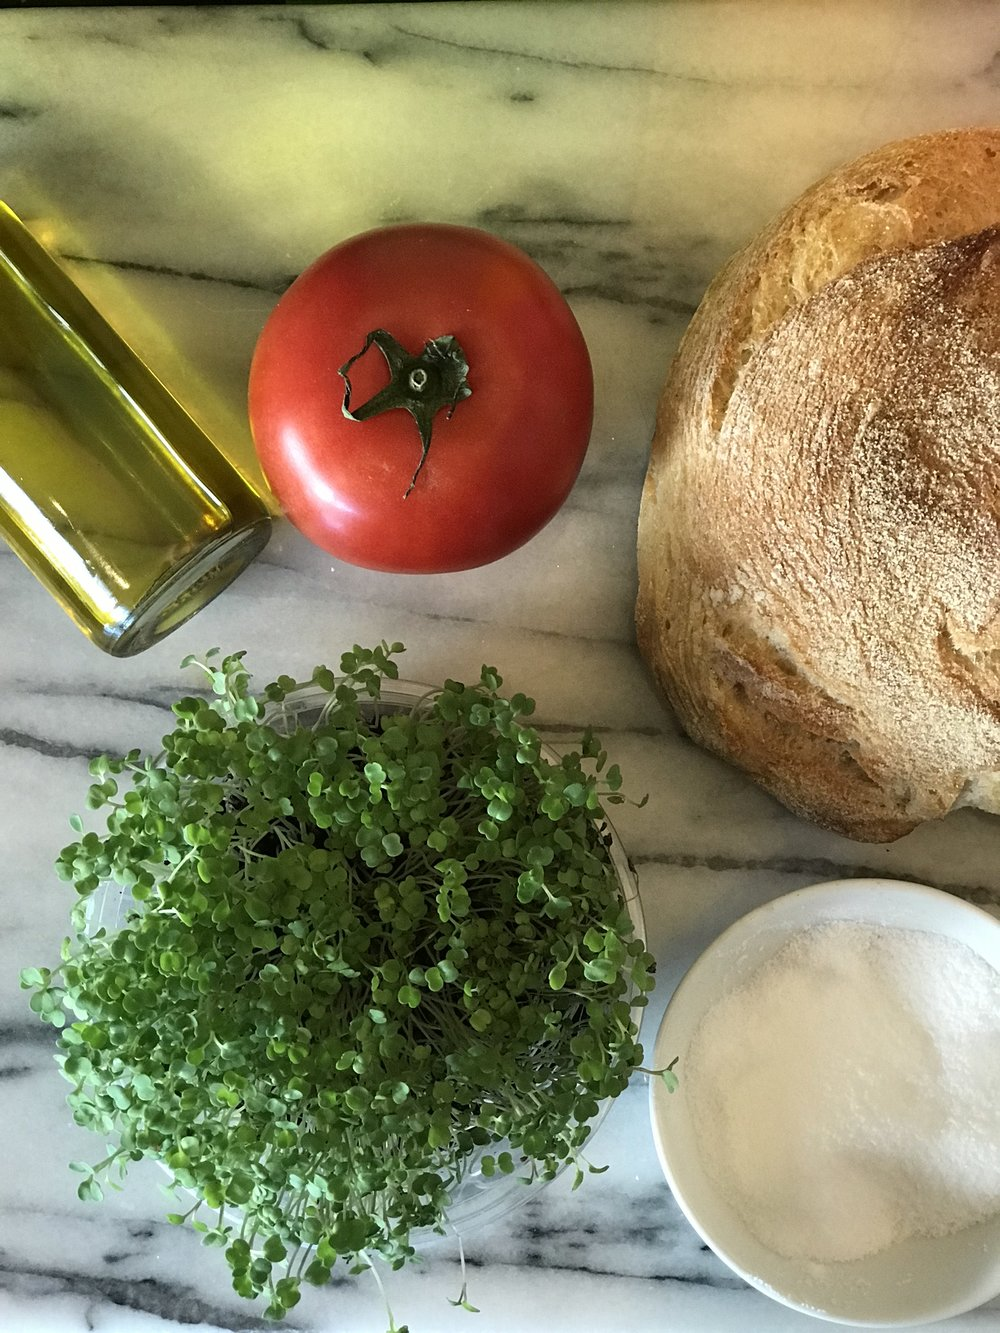 Extra Virgin Olive Oil, Tomato, Ciabatta, Living Arugula Microgreens, Salt. Not pictured, fresh whole milk mozzarella.